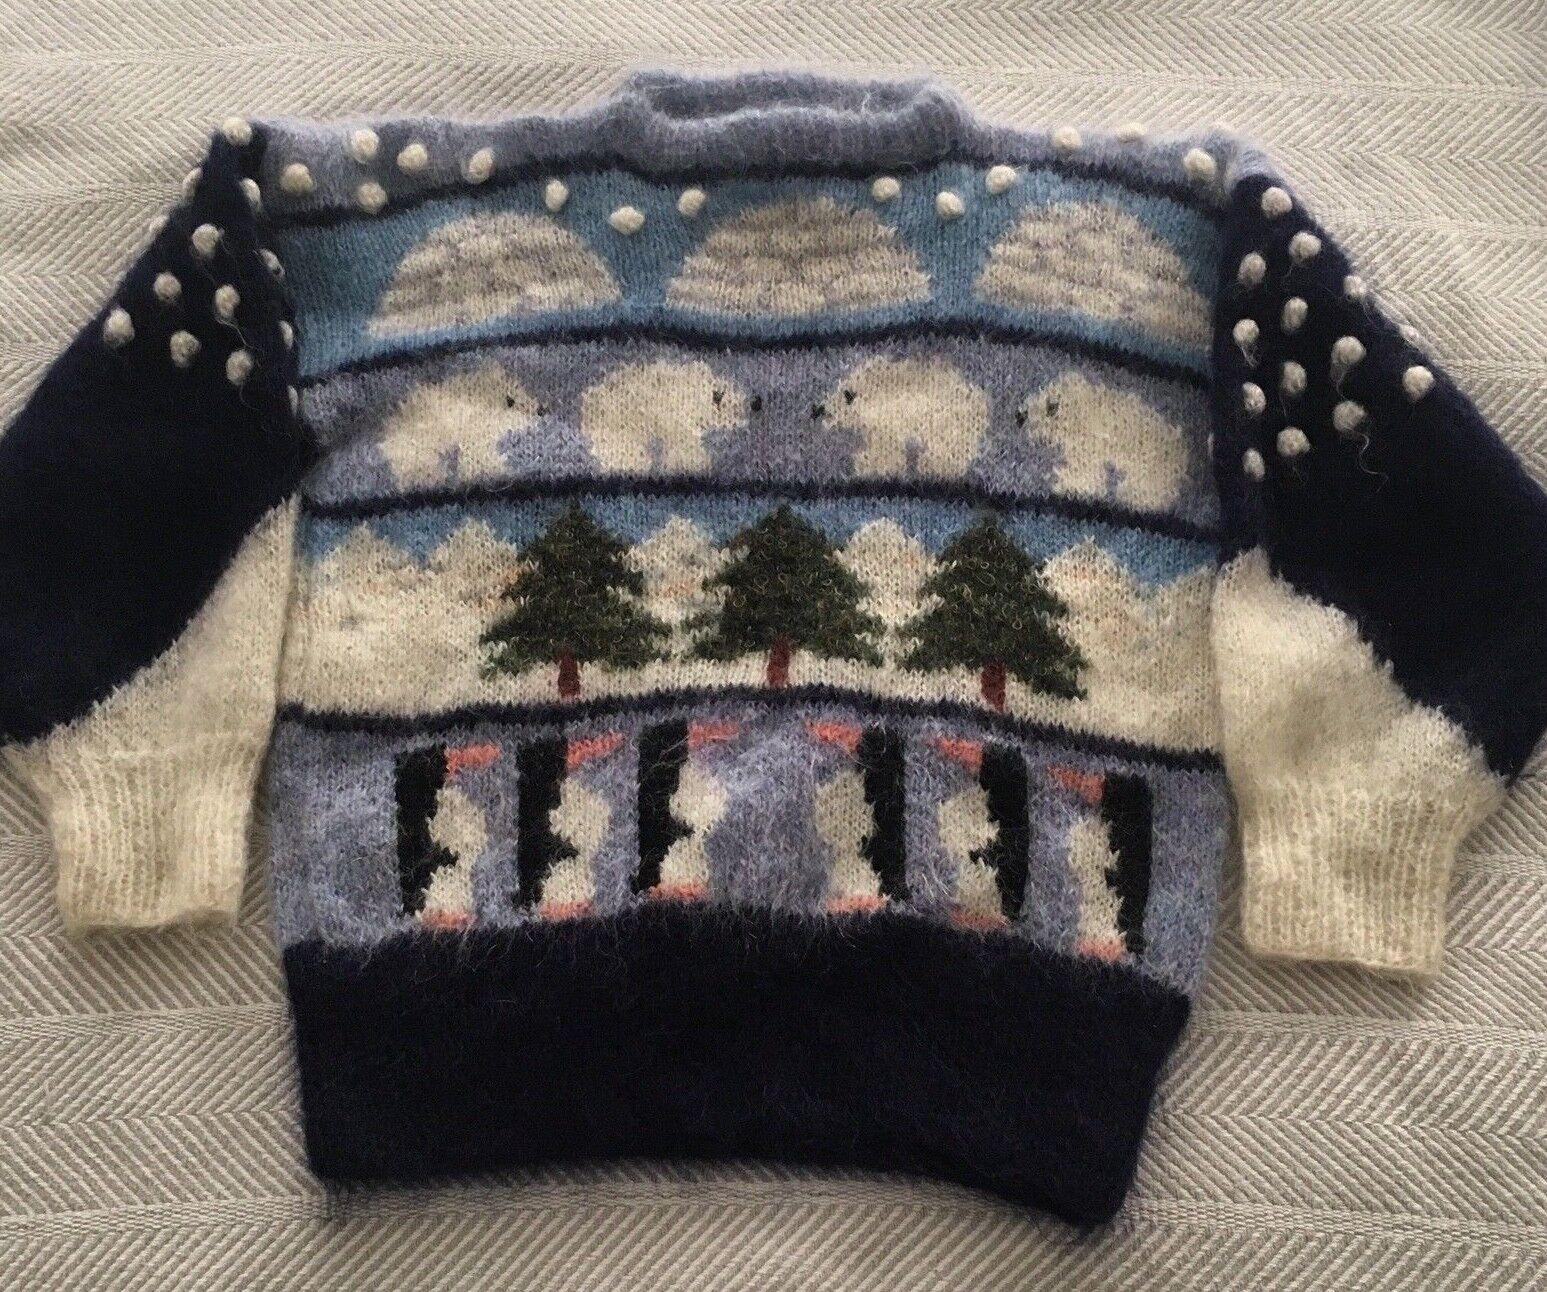 SUSIE LEE Mohair Sweater Hand Knitted Kent England Penguins Polar Bear VTG RARE